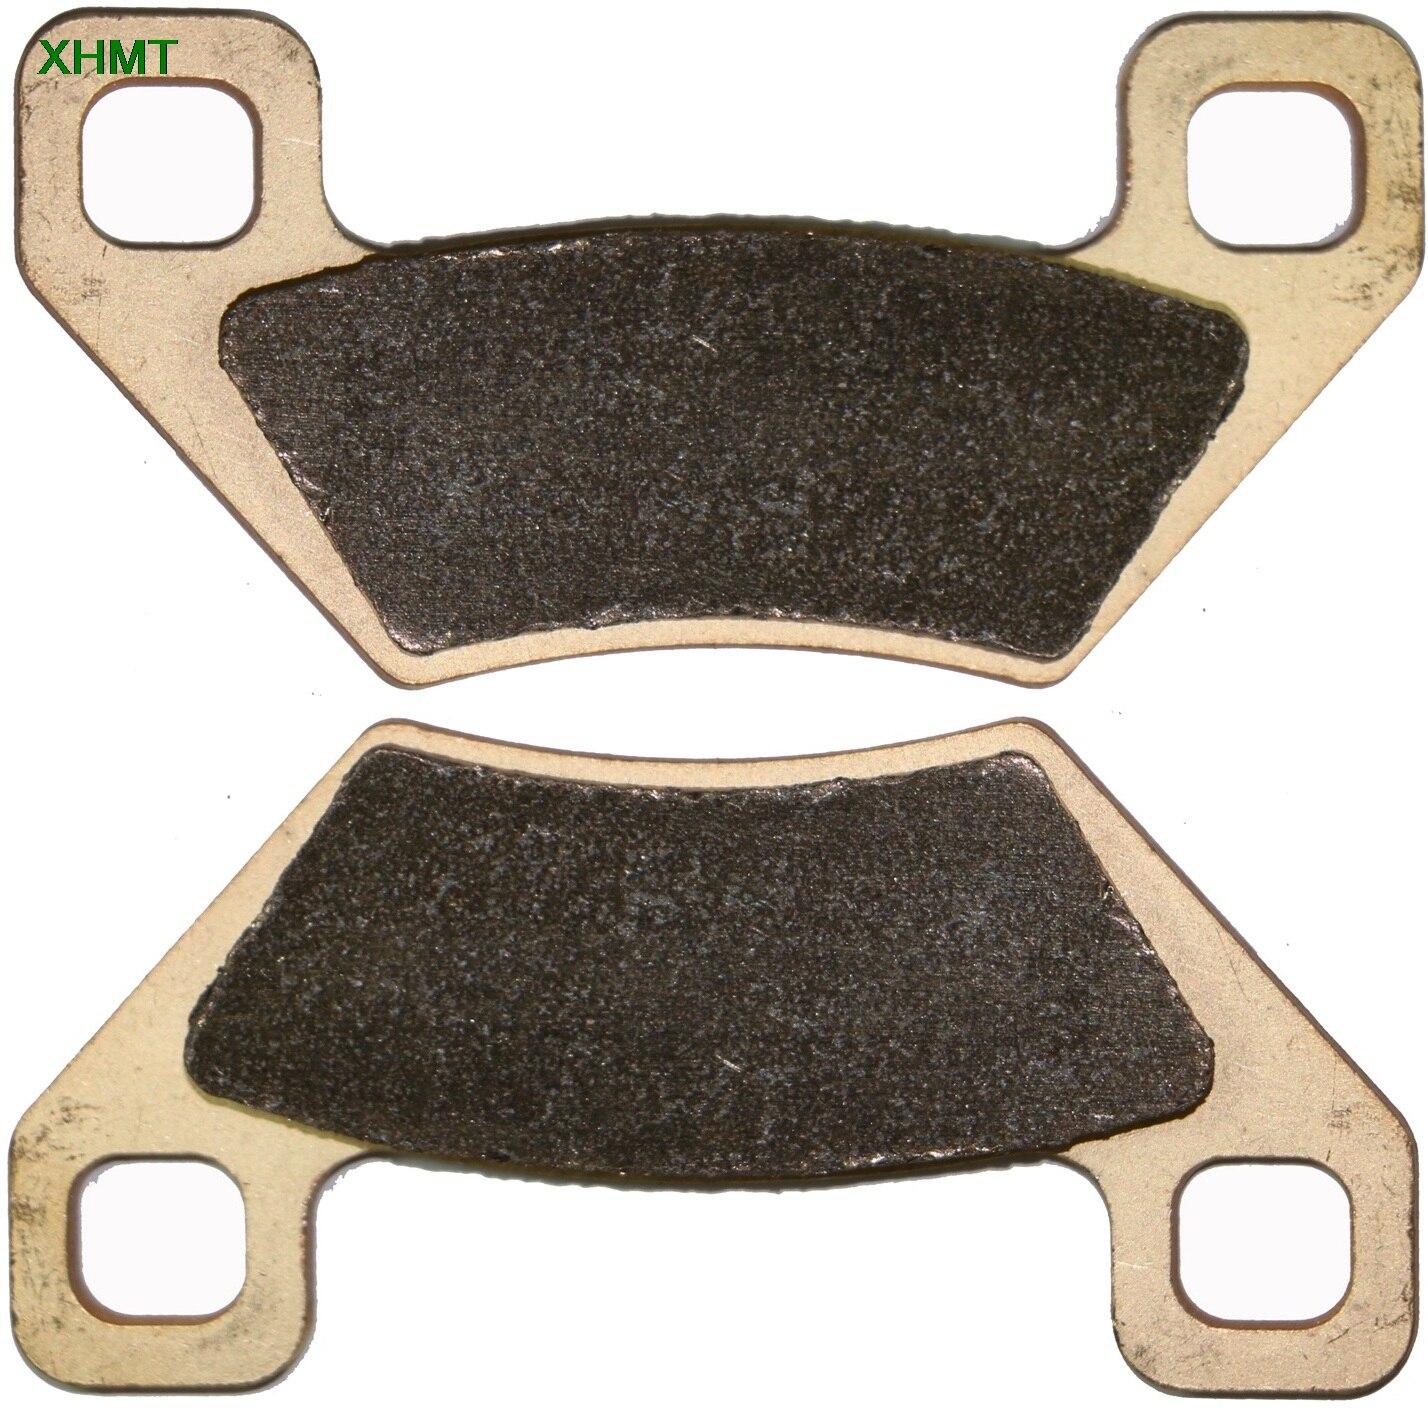 Cyleto Front /& Rear Brake Pads for ARCTIC CAT 700 EFi 4x4 Auto LE Utility M4 TRV LE SE Cruiser 2006 2007 2008 2011